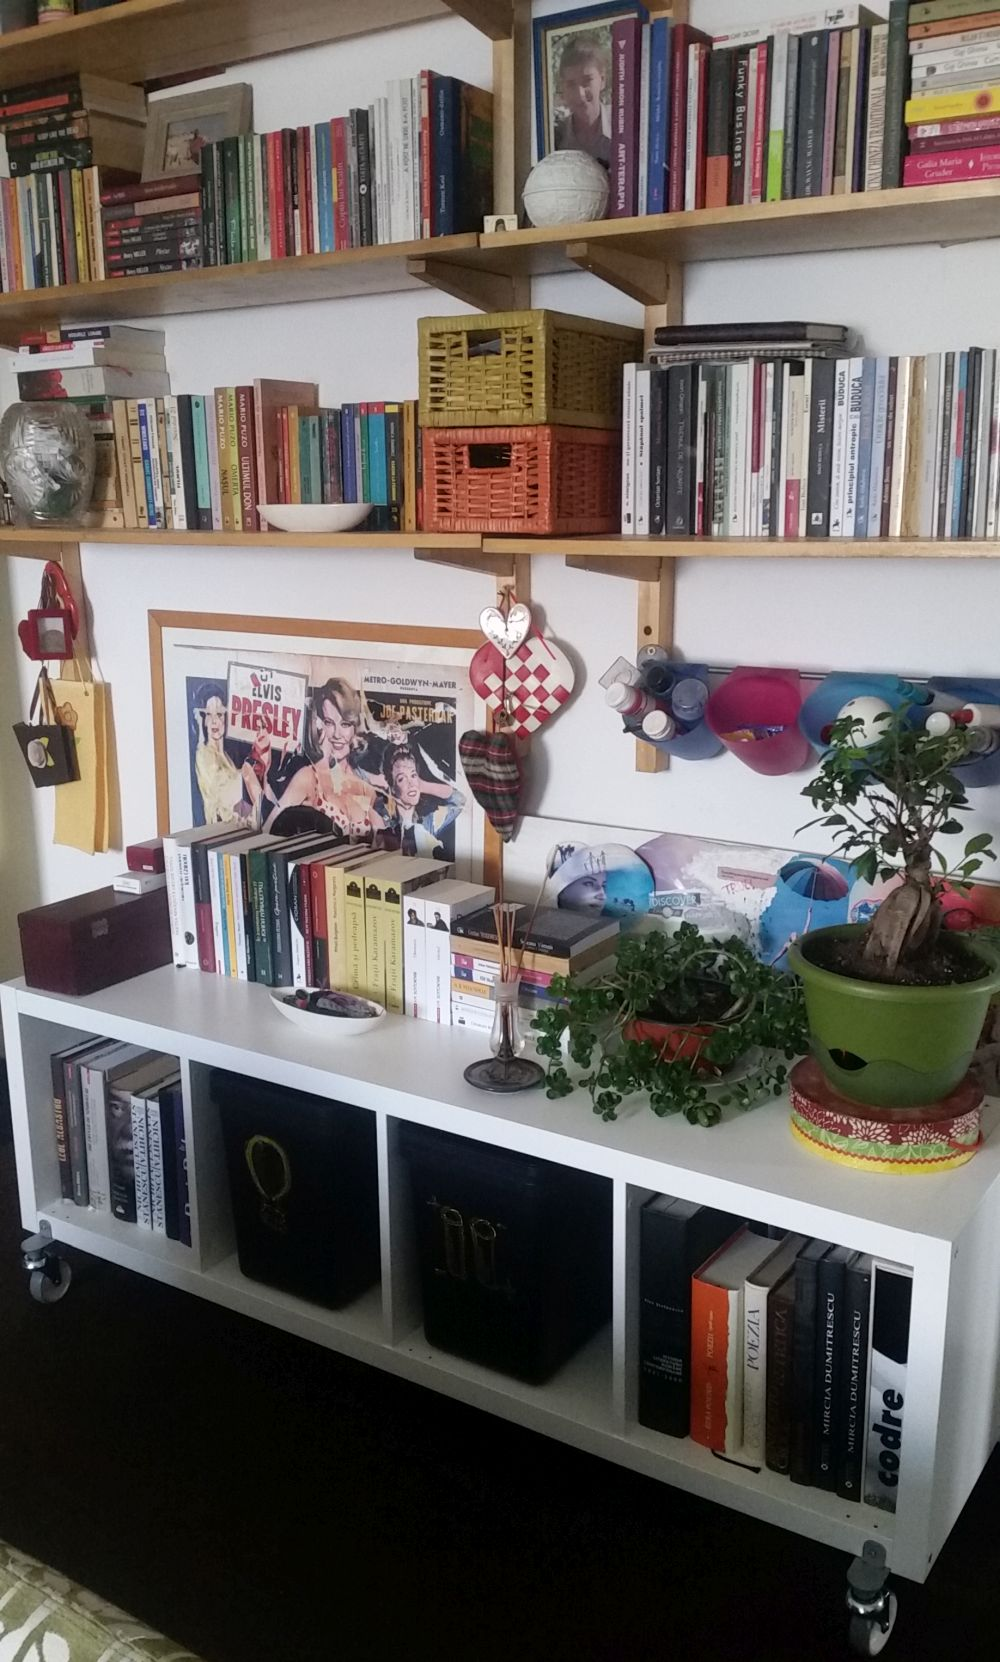 adelaparvu.com despe schimbari mici efecte mari, experiment IKEA sustenabilitate (5)